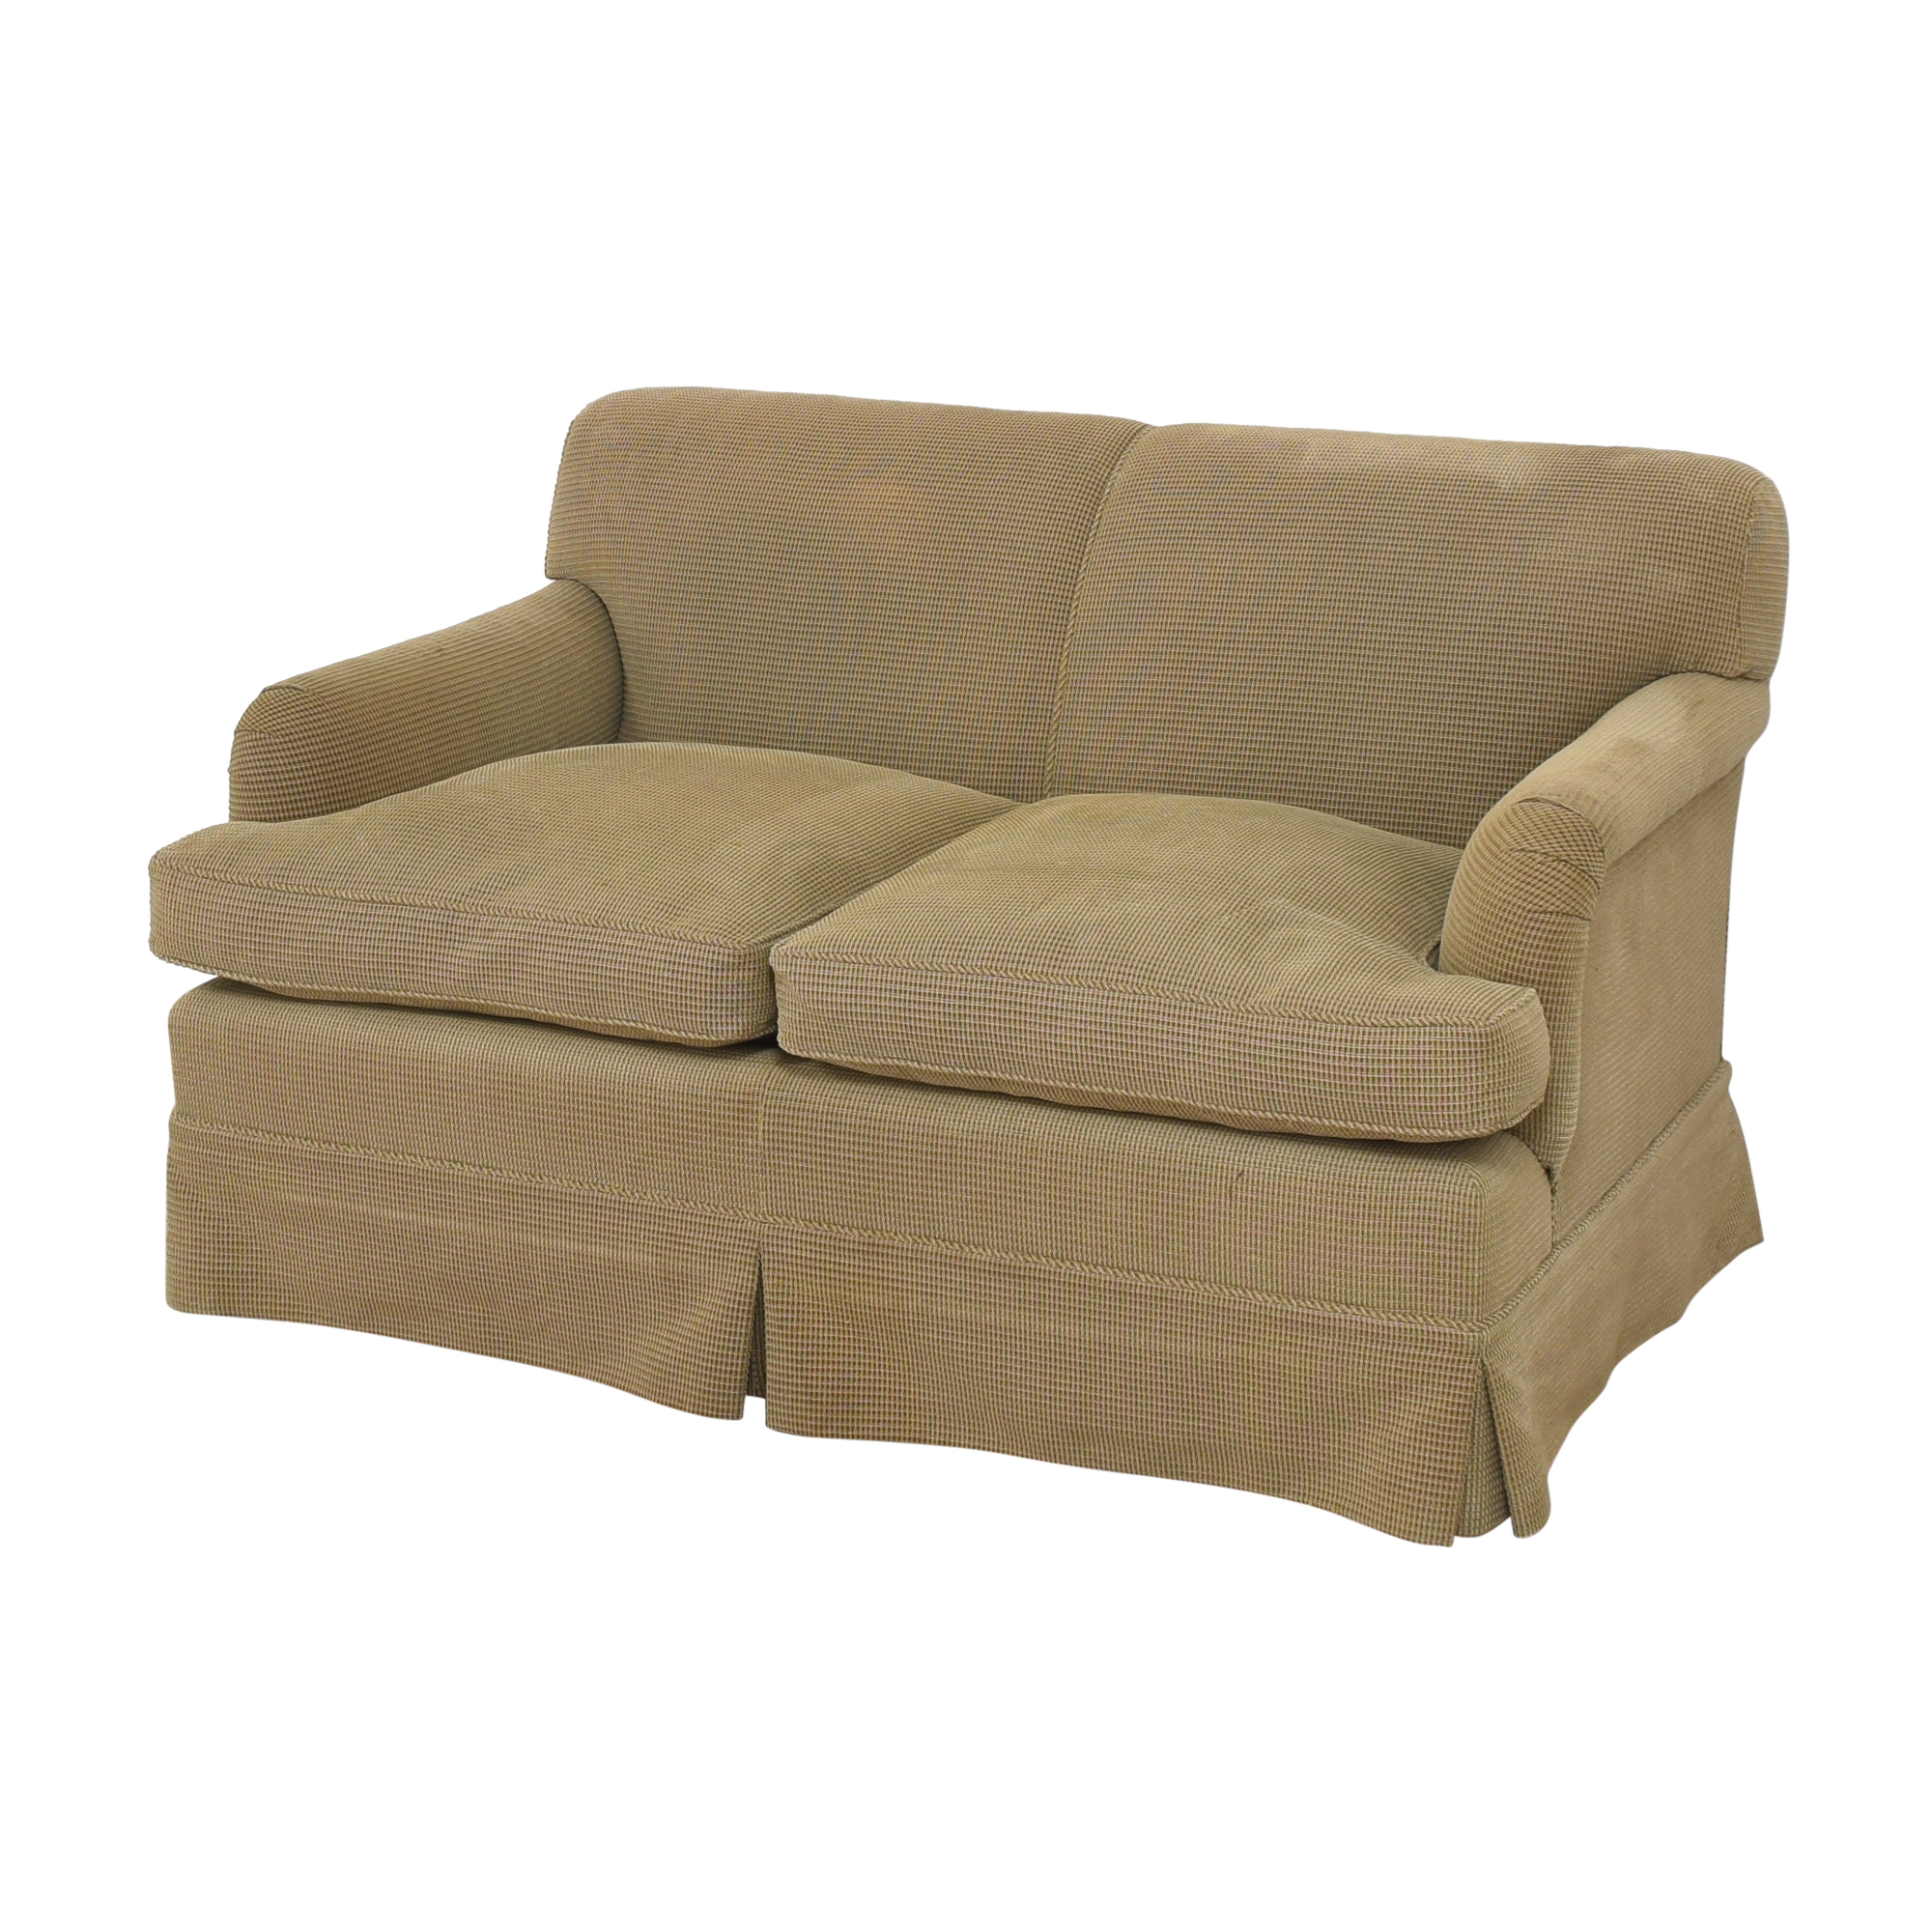 Custom Two Cushion Sofa price